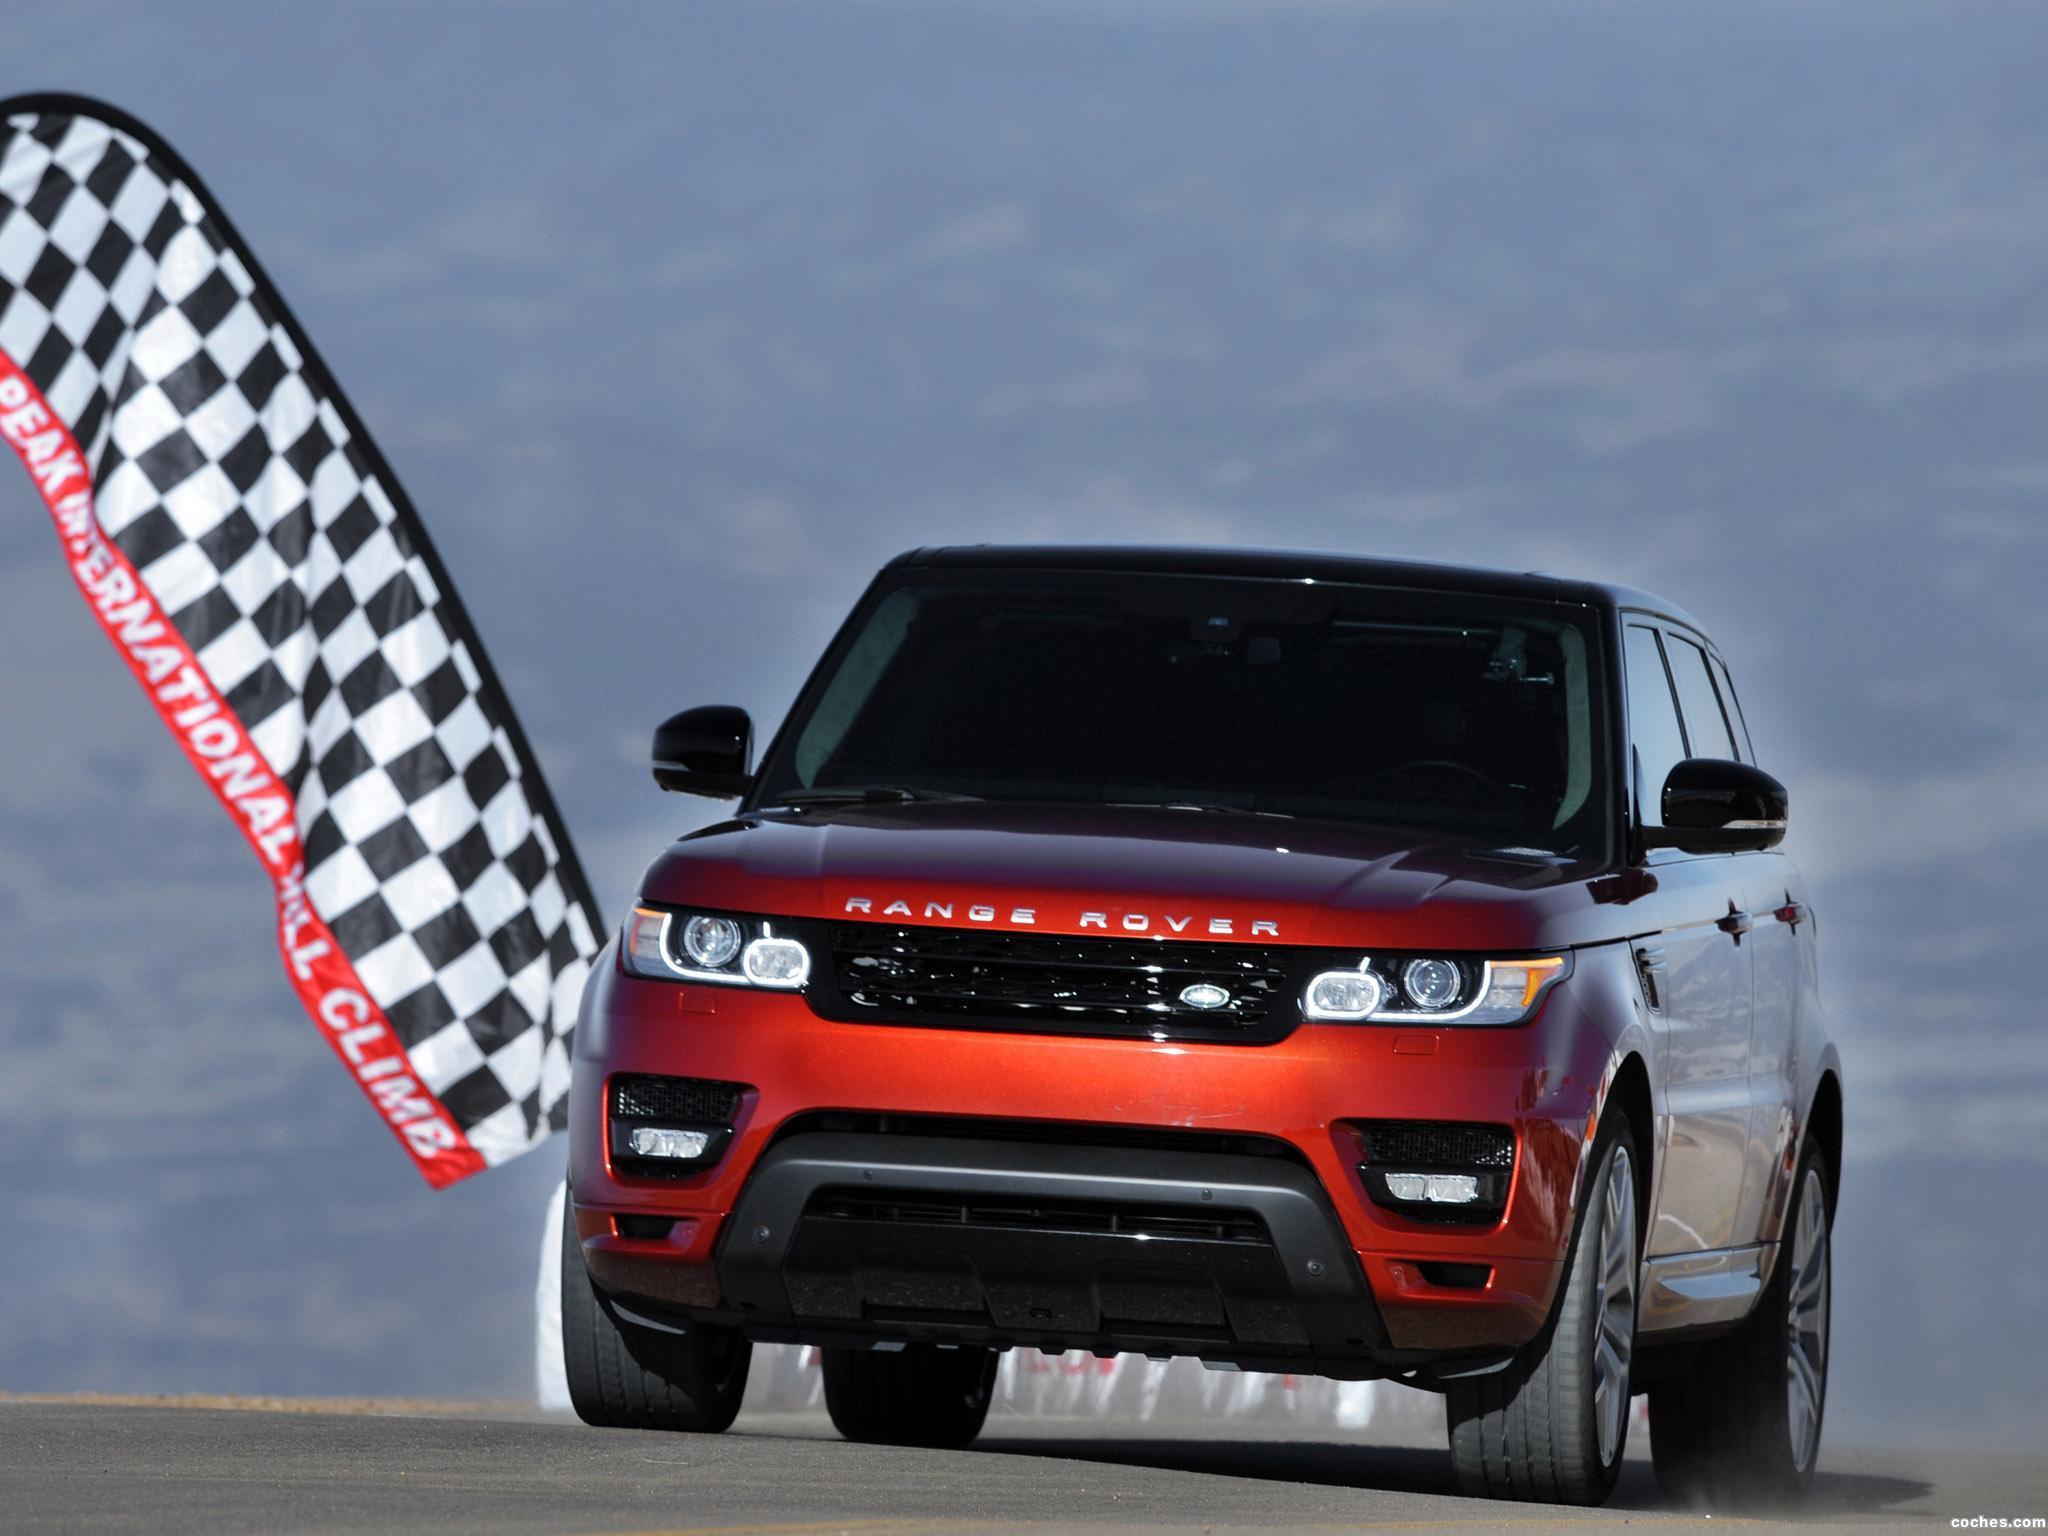 Foto 0 de Land Rover Range Rover Sport Pikes Peak Hill Climb Record Car 2013